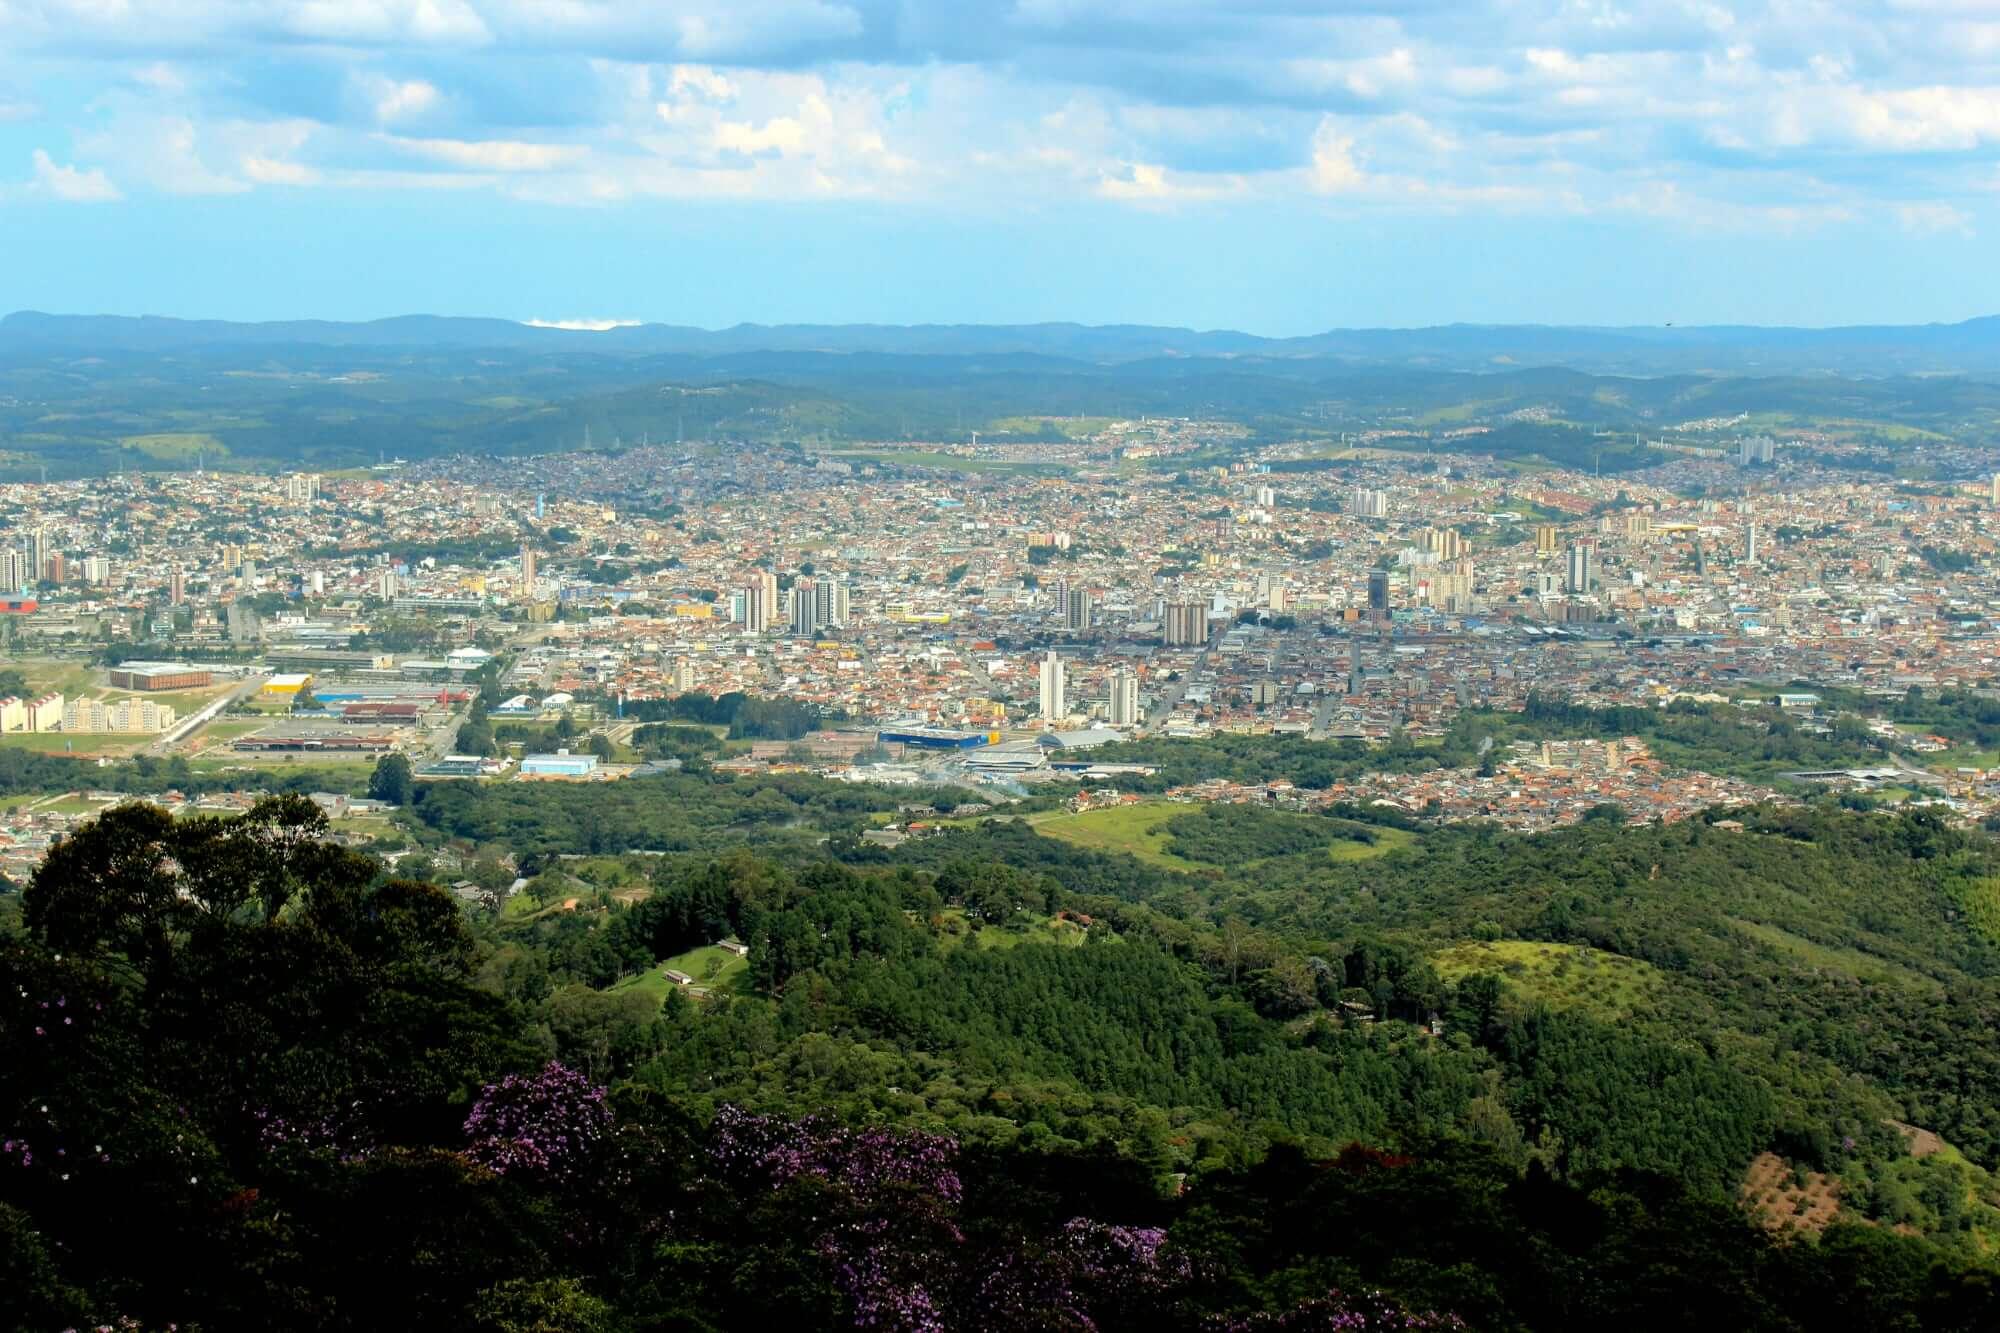 View from Pico do Urubu - Mogi das Cruzes, Brazil